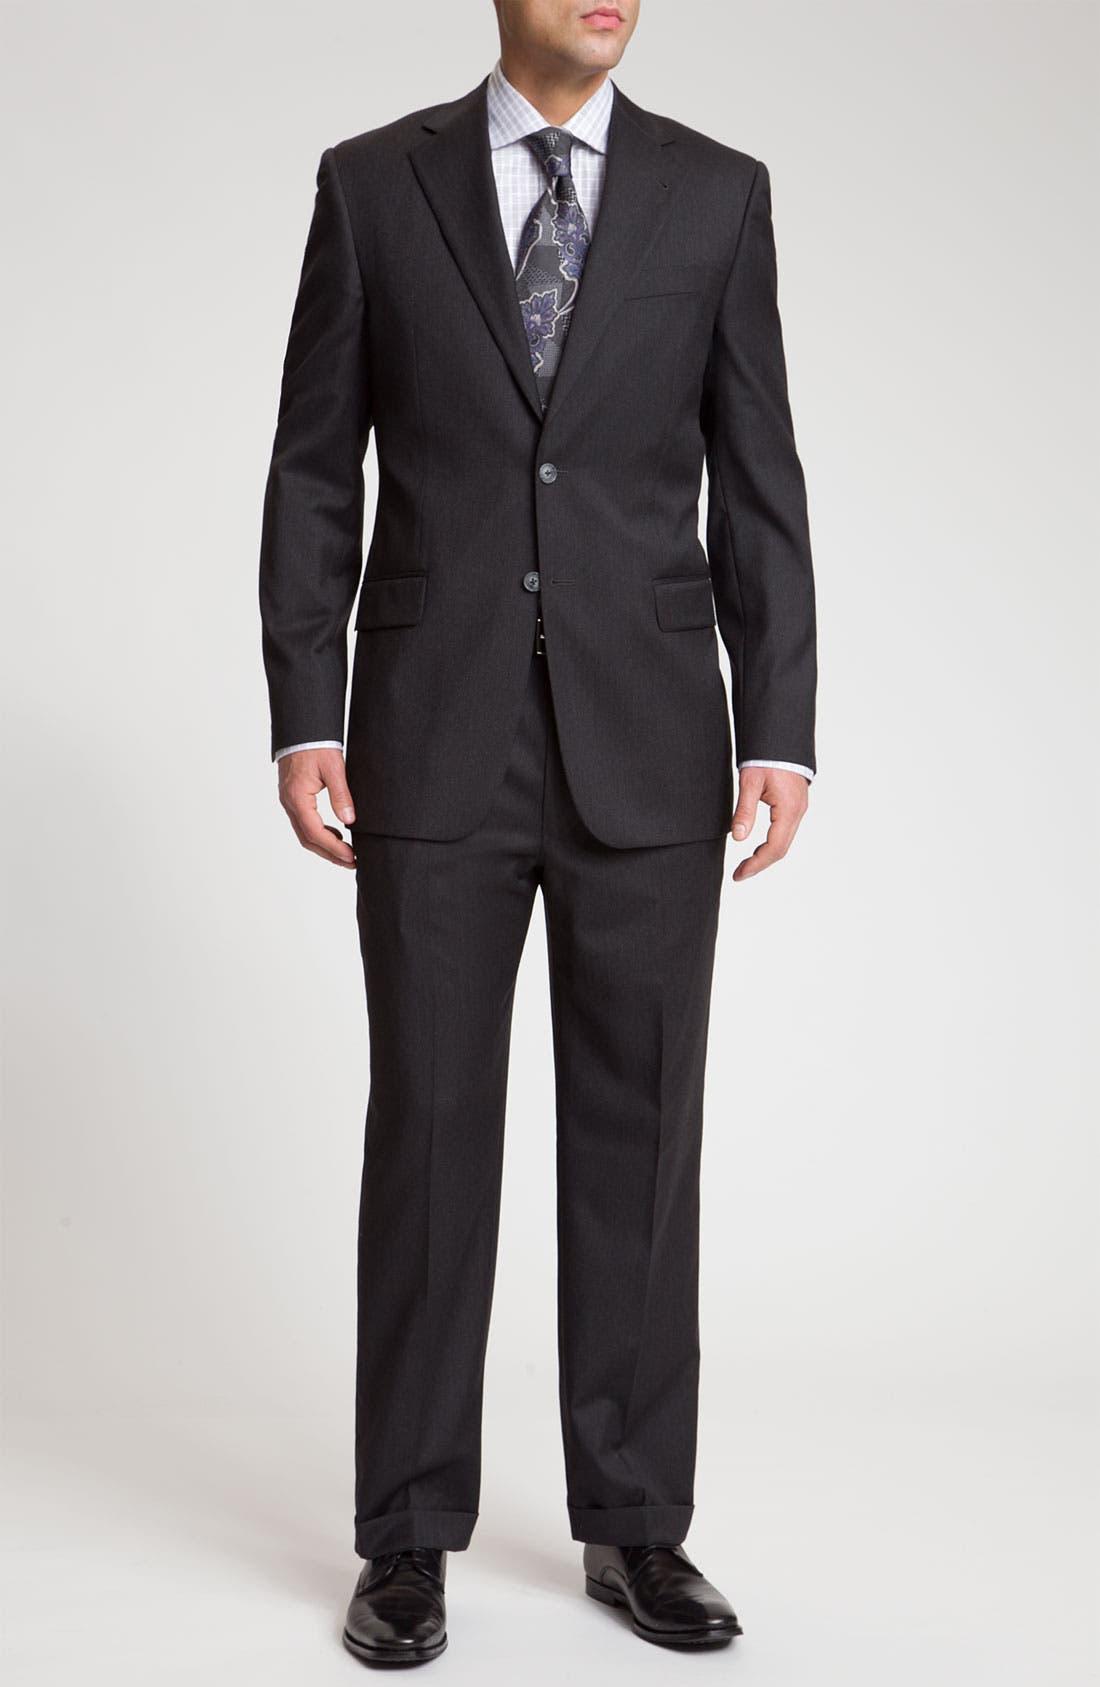 Alternate Image 2  - Joseph Abboud 'Signature Silver' Dark Grey Wool Suit